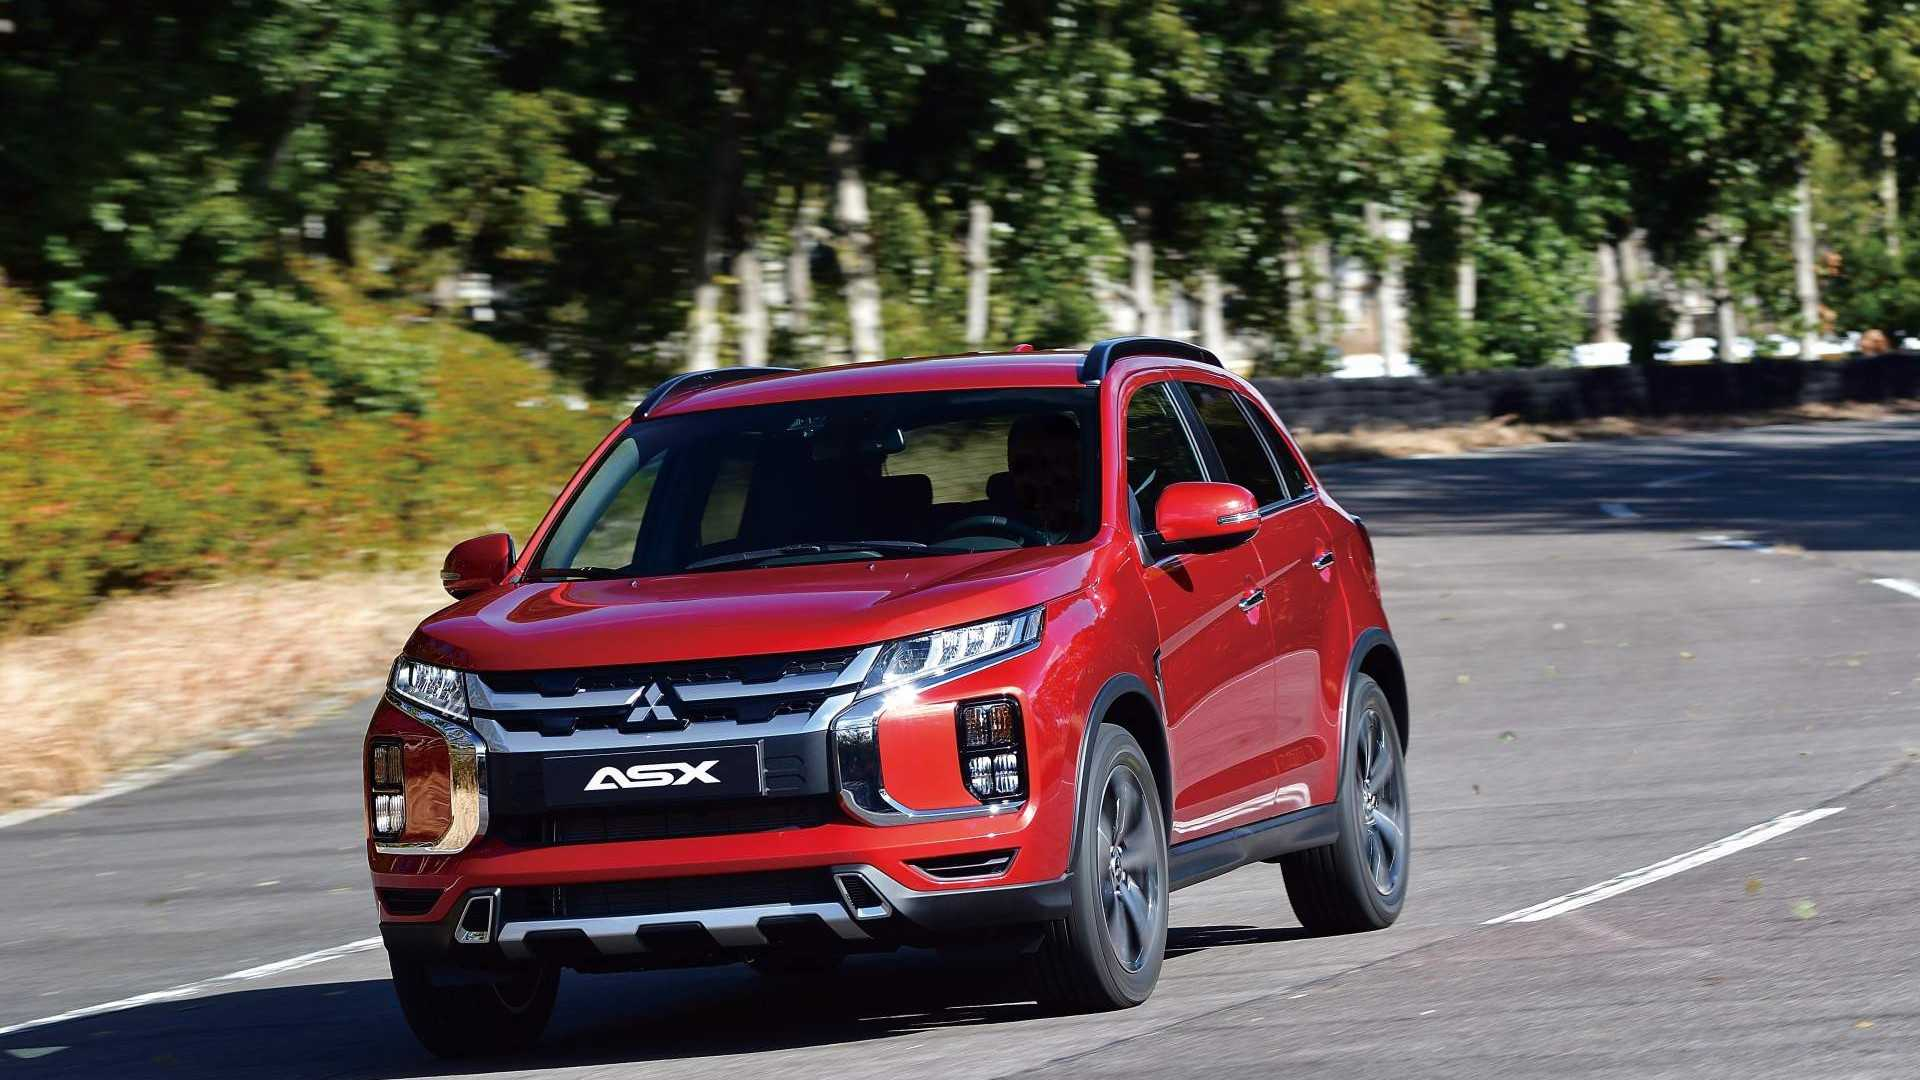 37 Gallery of Uusi Mitsubishi Asx 2020 Spesification by Uusi Mitsubishi Asx 2020